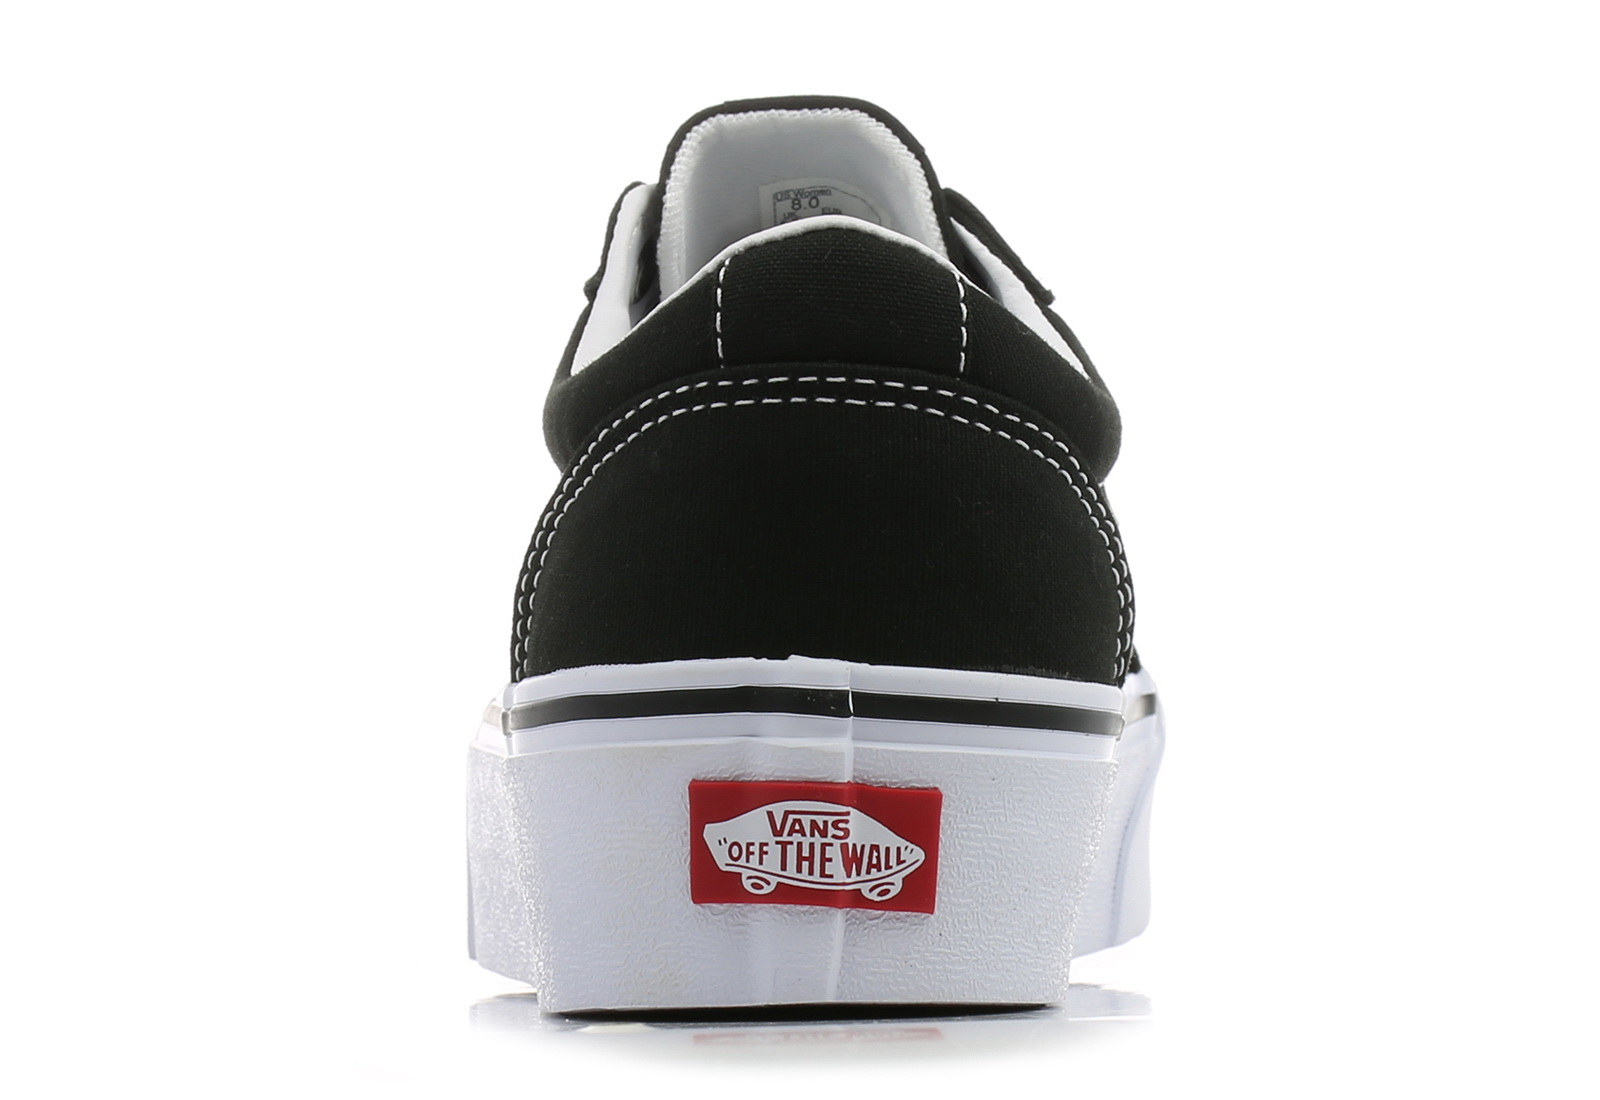 Vans Cipő - Wm Ward Platform - VA3TLC187 - Office Shoes Magyarország 7adf8fa4f7